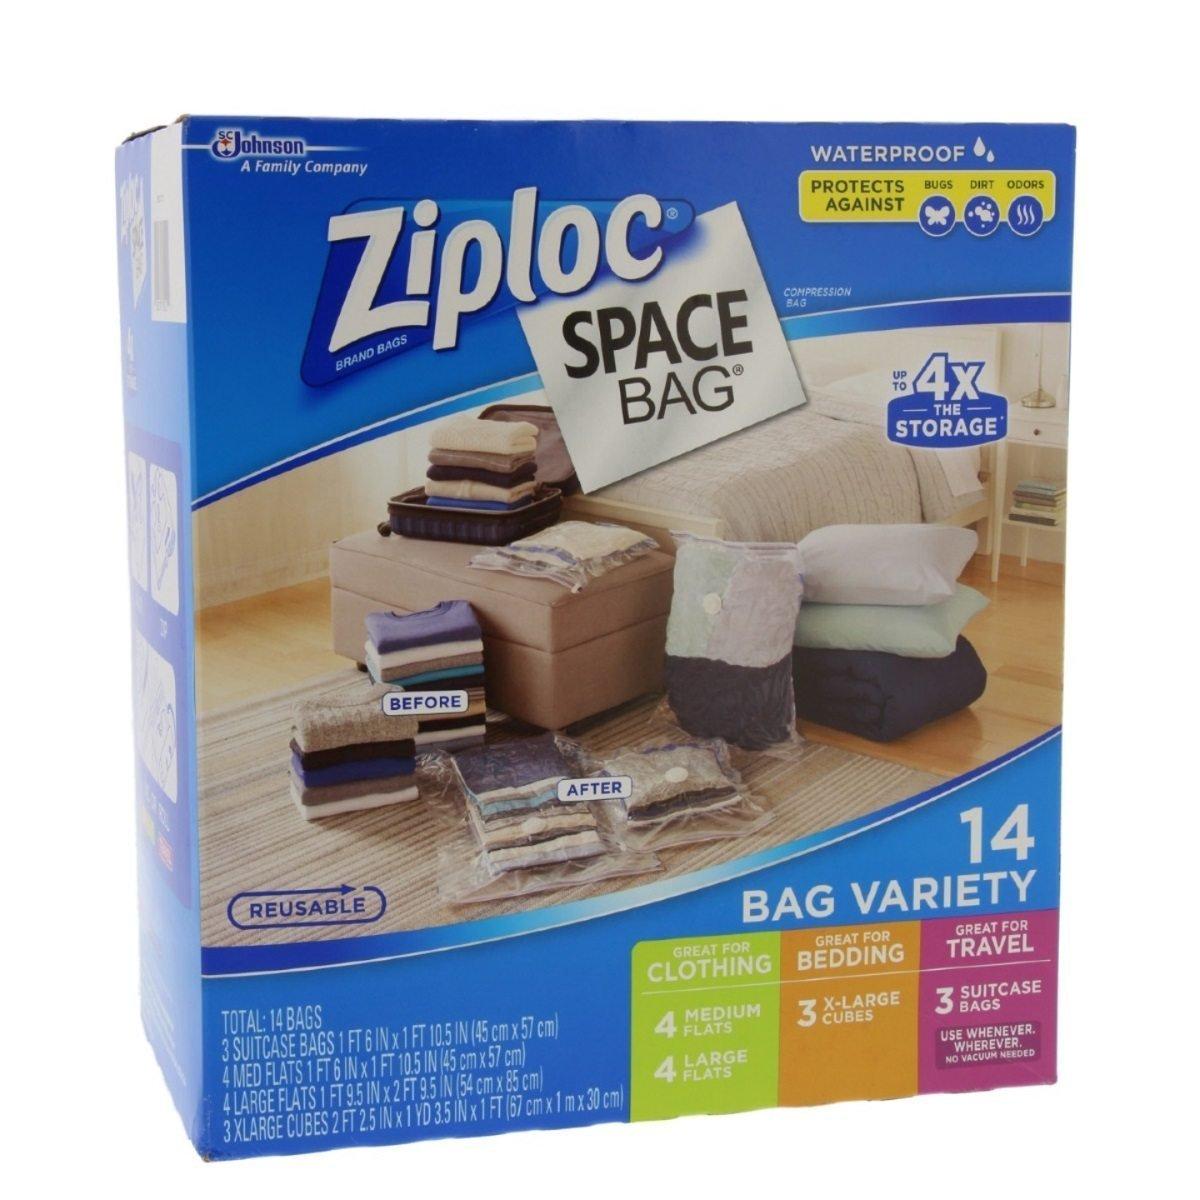 Ziploc Space Bag 14 Bag Variety - 14pc 4-M, 4-L, 3-XL Cubes, 3-Trvl by Ziploc